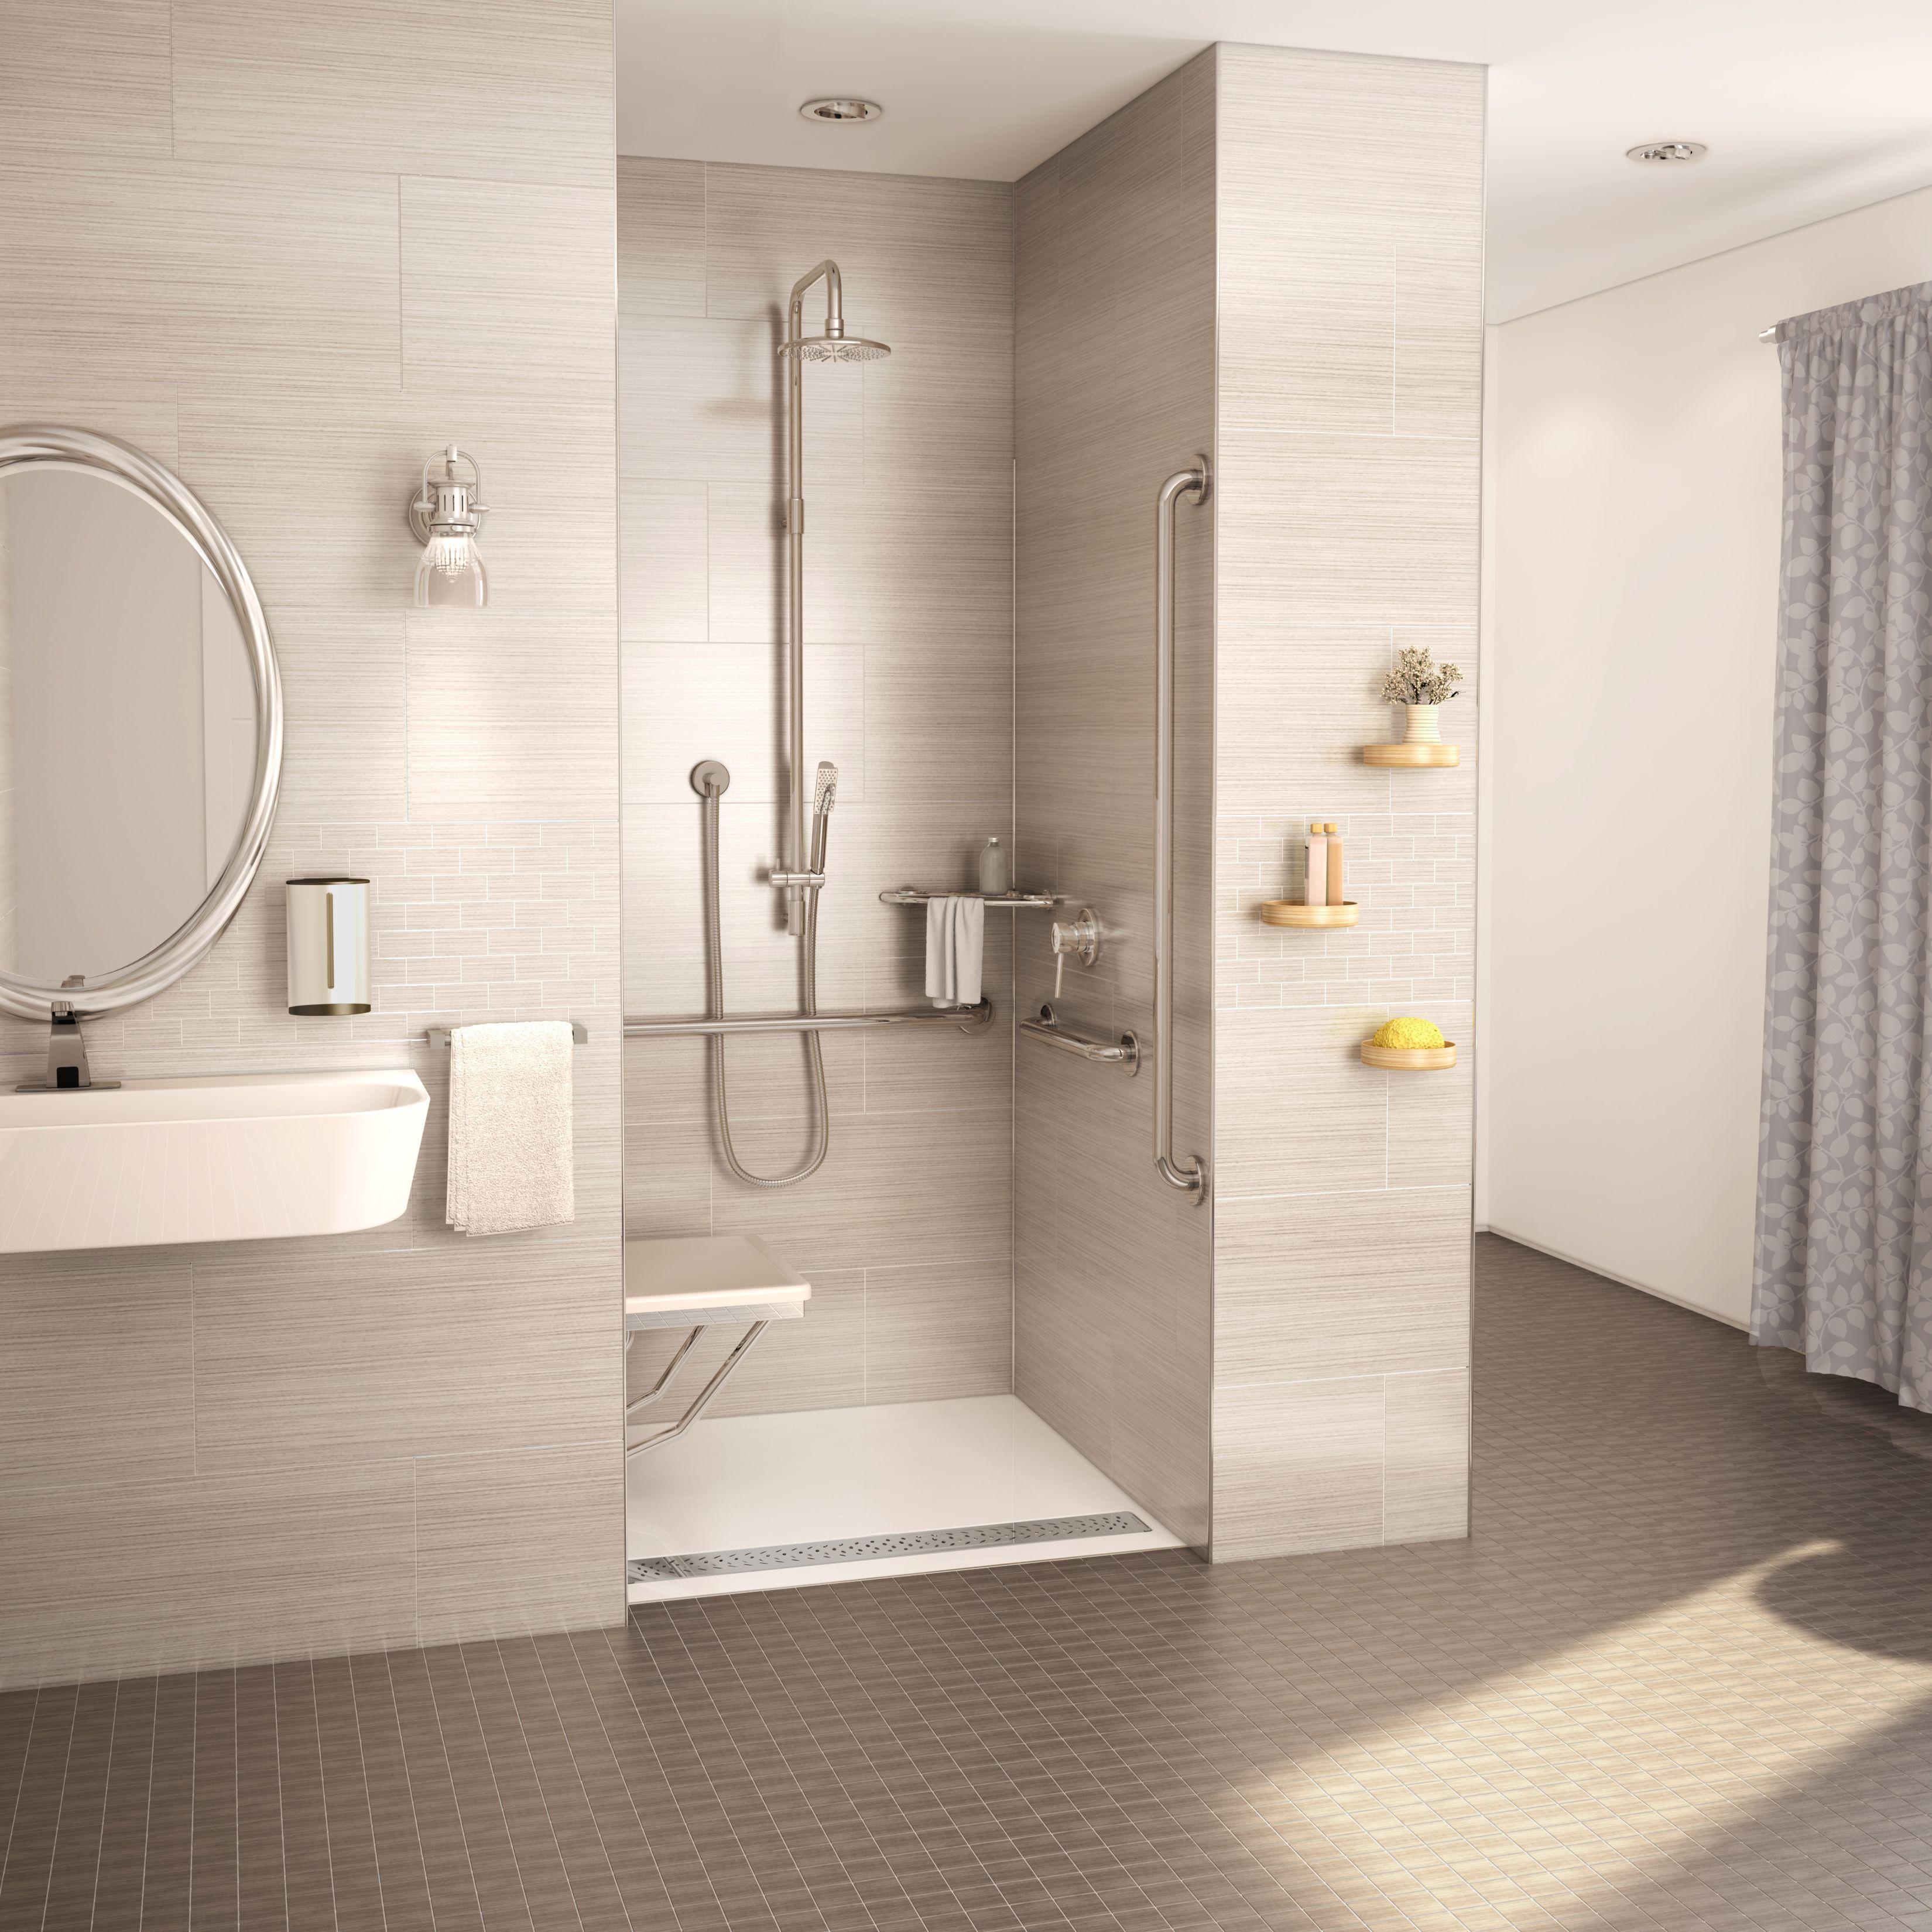 Http Plomberieroy Com Residentiel Produits Adaptes Adaptek Transfer Shower Base Base De Douche Salle De Bain Salle De Bain Design